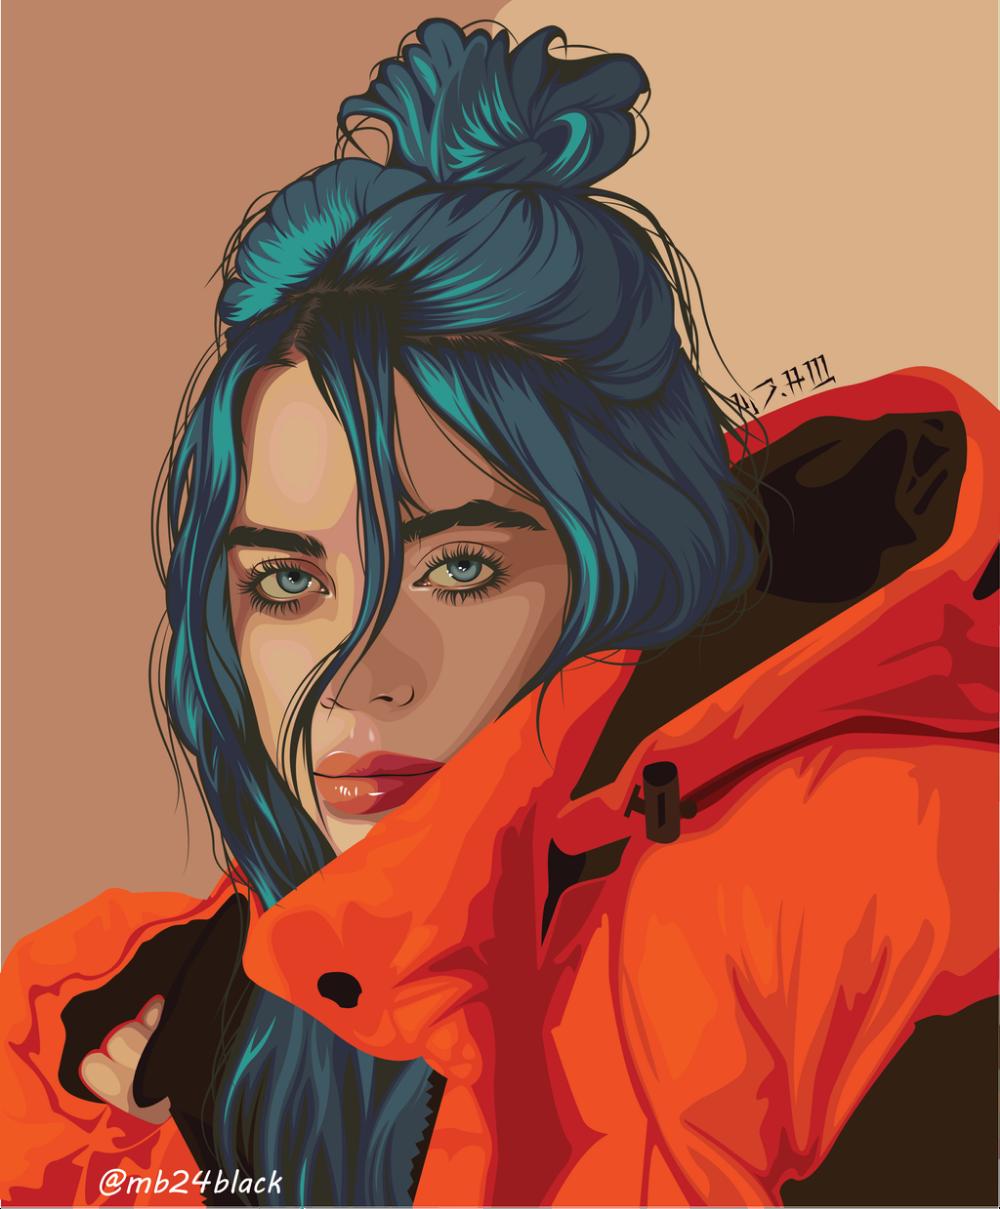 Billish By Mb24black On Deviantart Billie Eilish Celebrity Drawings Digital Art Girl